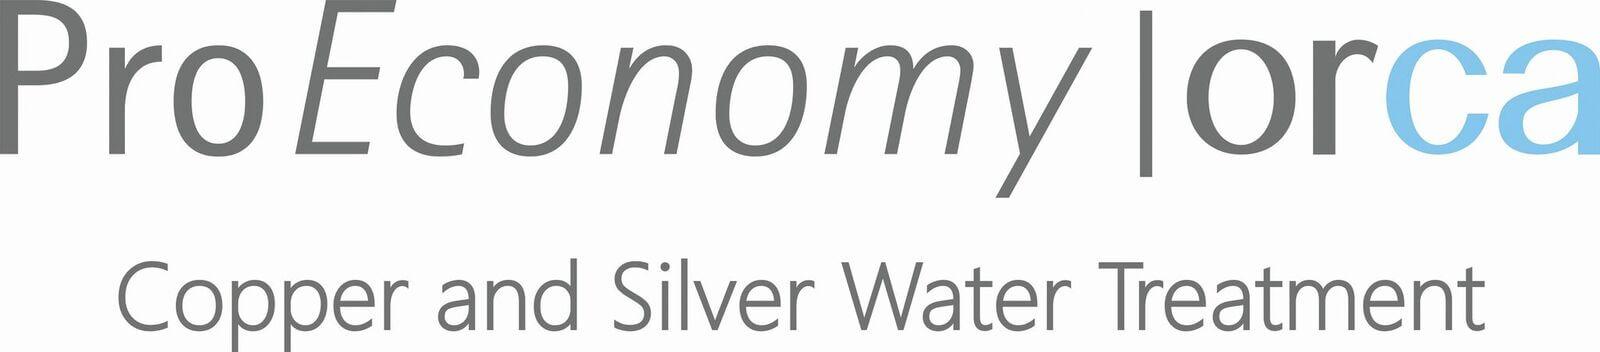 pro economy logo 2017 pro economy